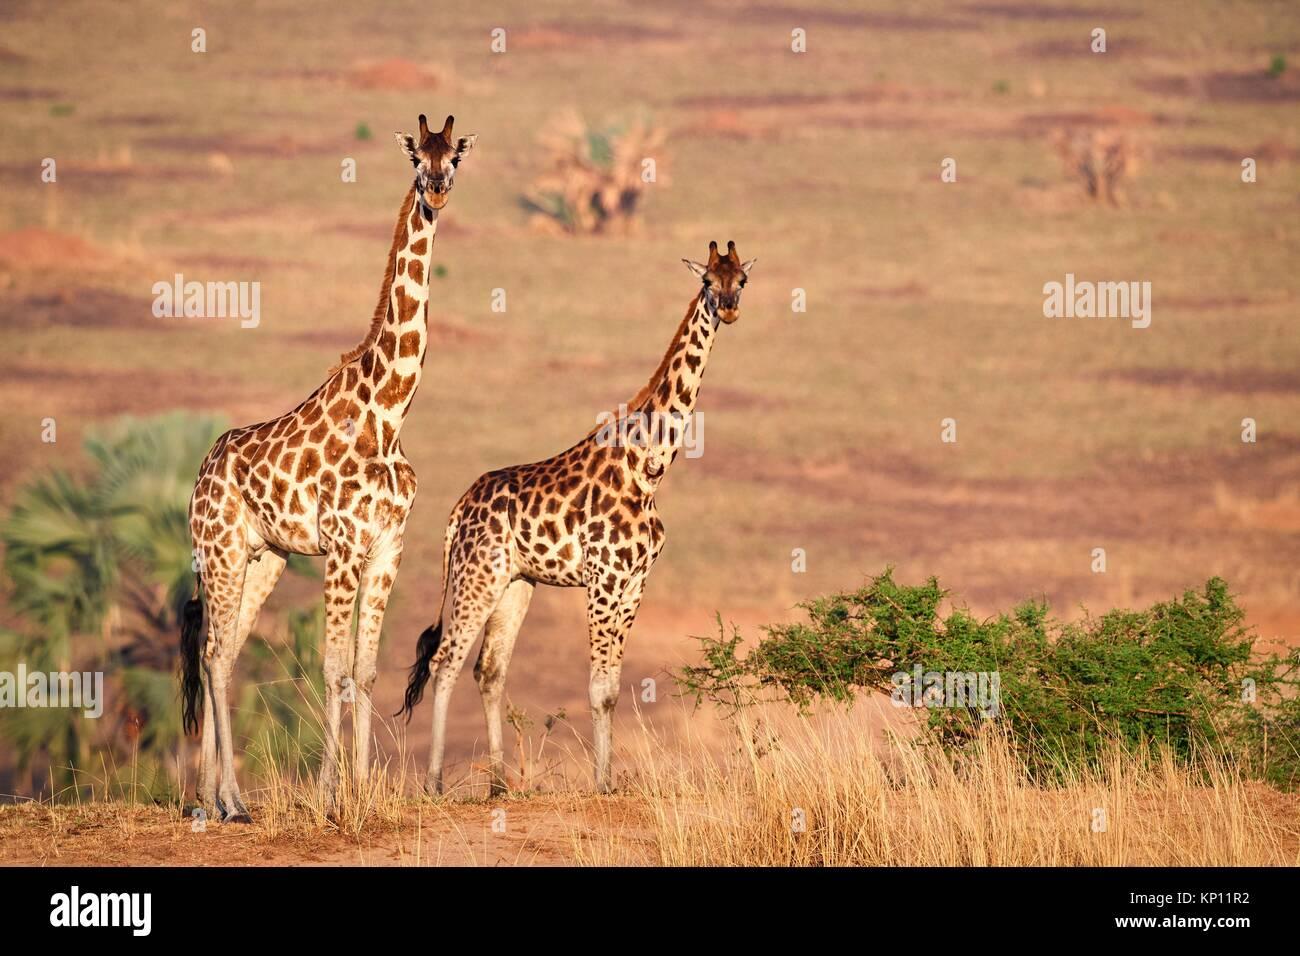 Rothschild Girafe (Giraffa camelopardalis rothschildi) femmes dans Murchisson Falls National Park, de l'Ouganda. Photo Stock